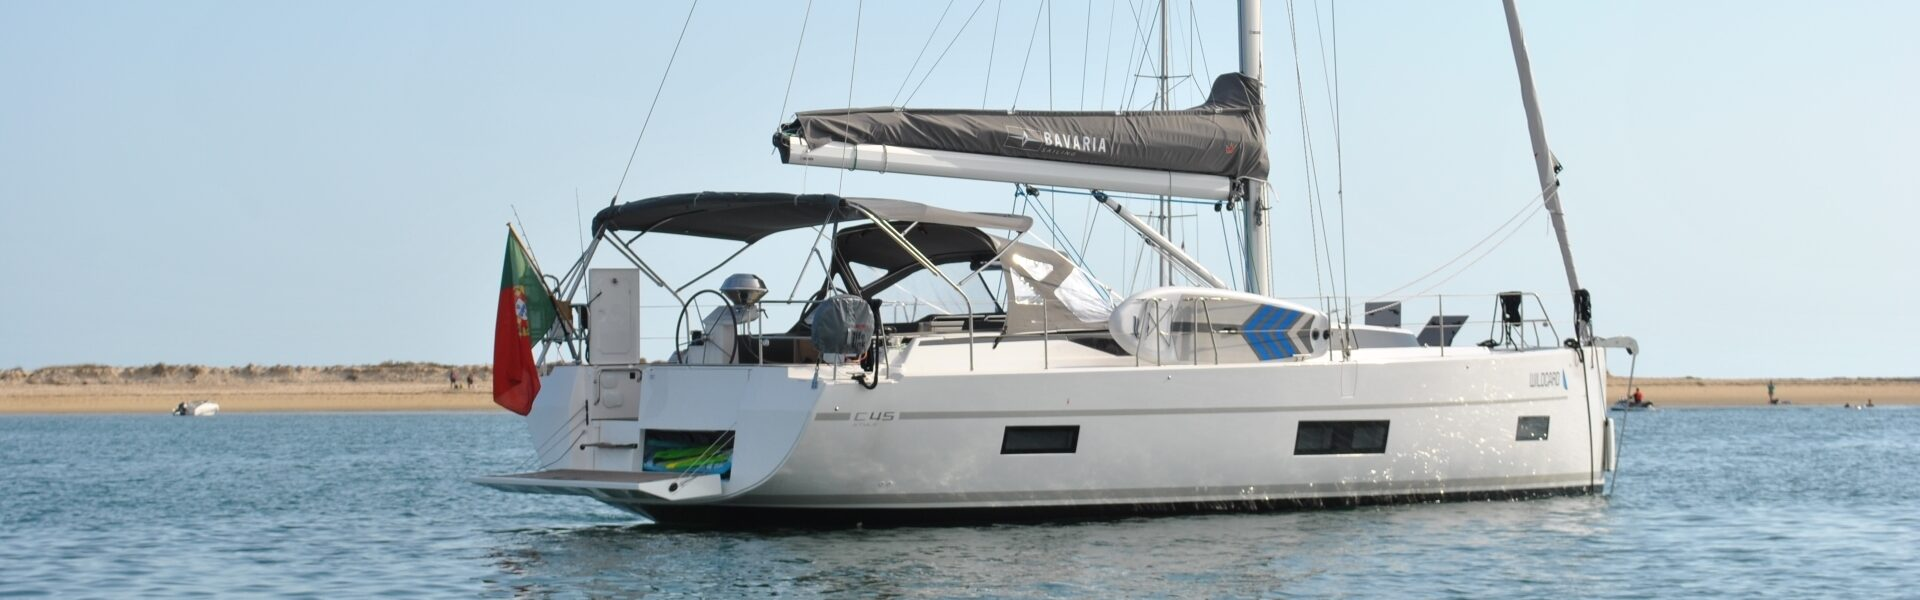 sailing cruise in Cascais